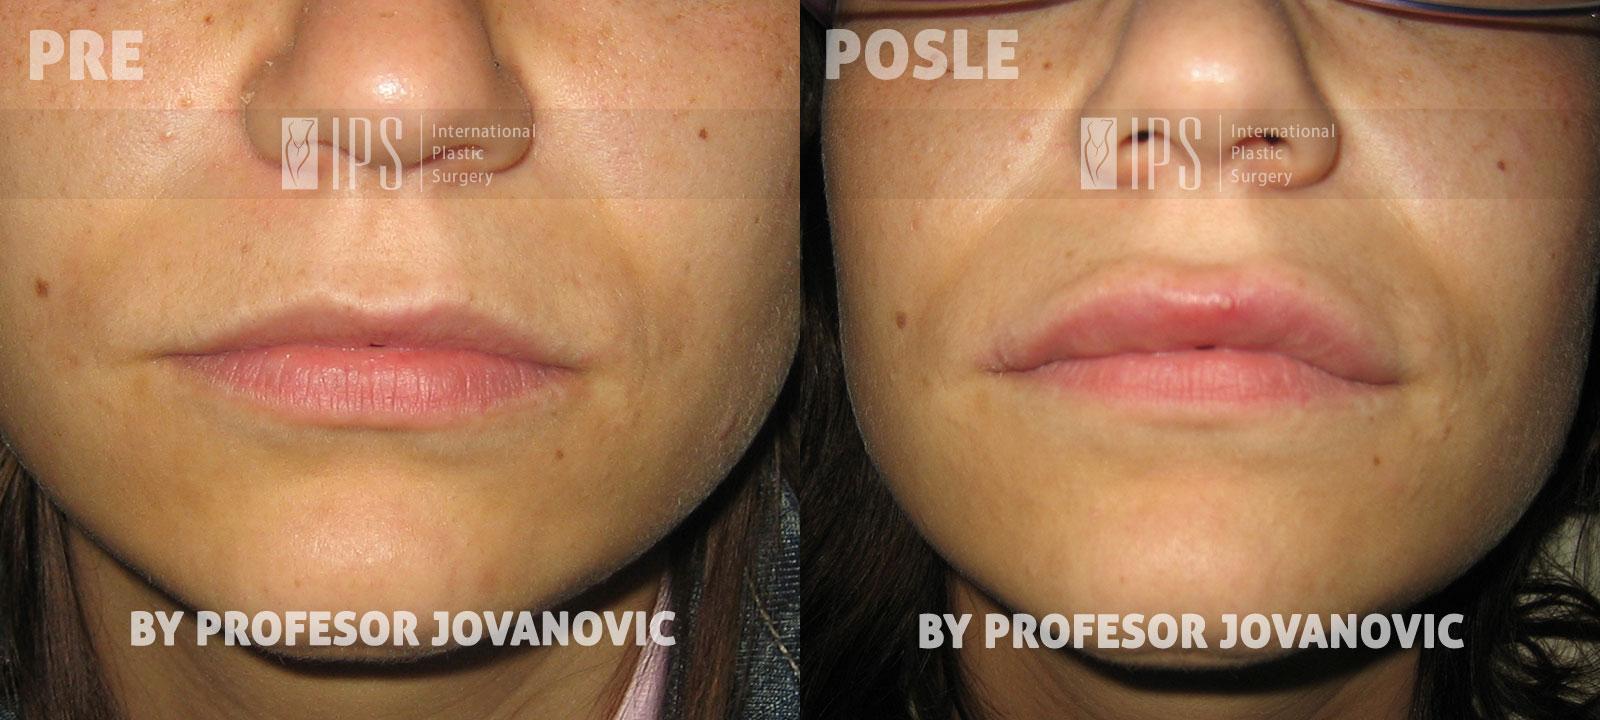 Povećanje usana - pre i posle